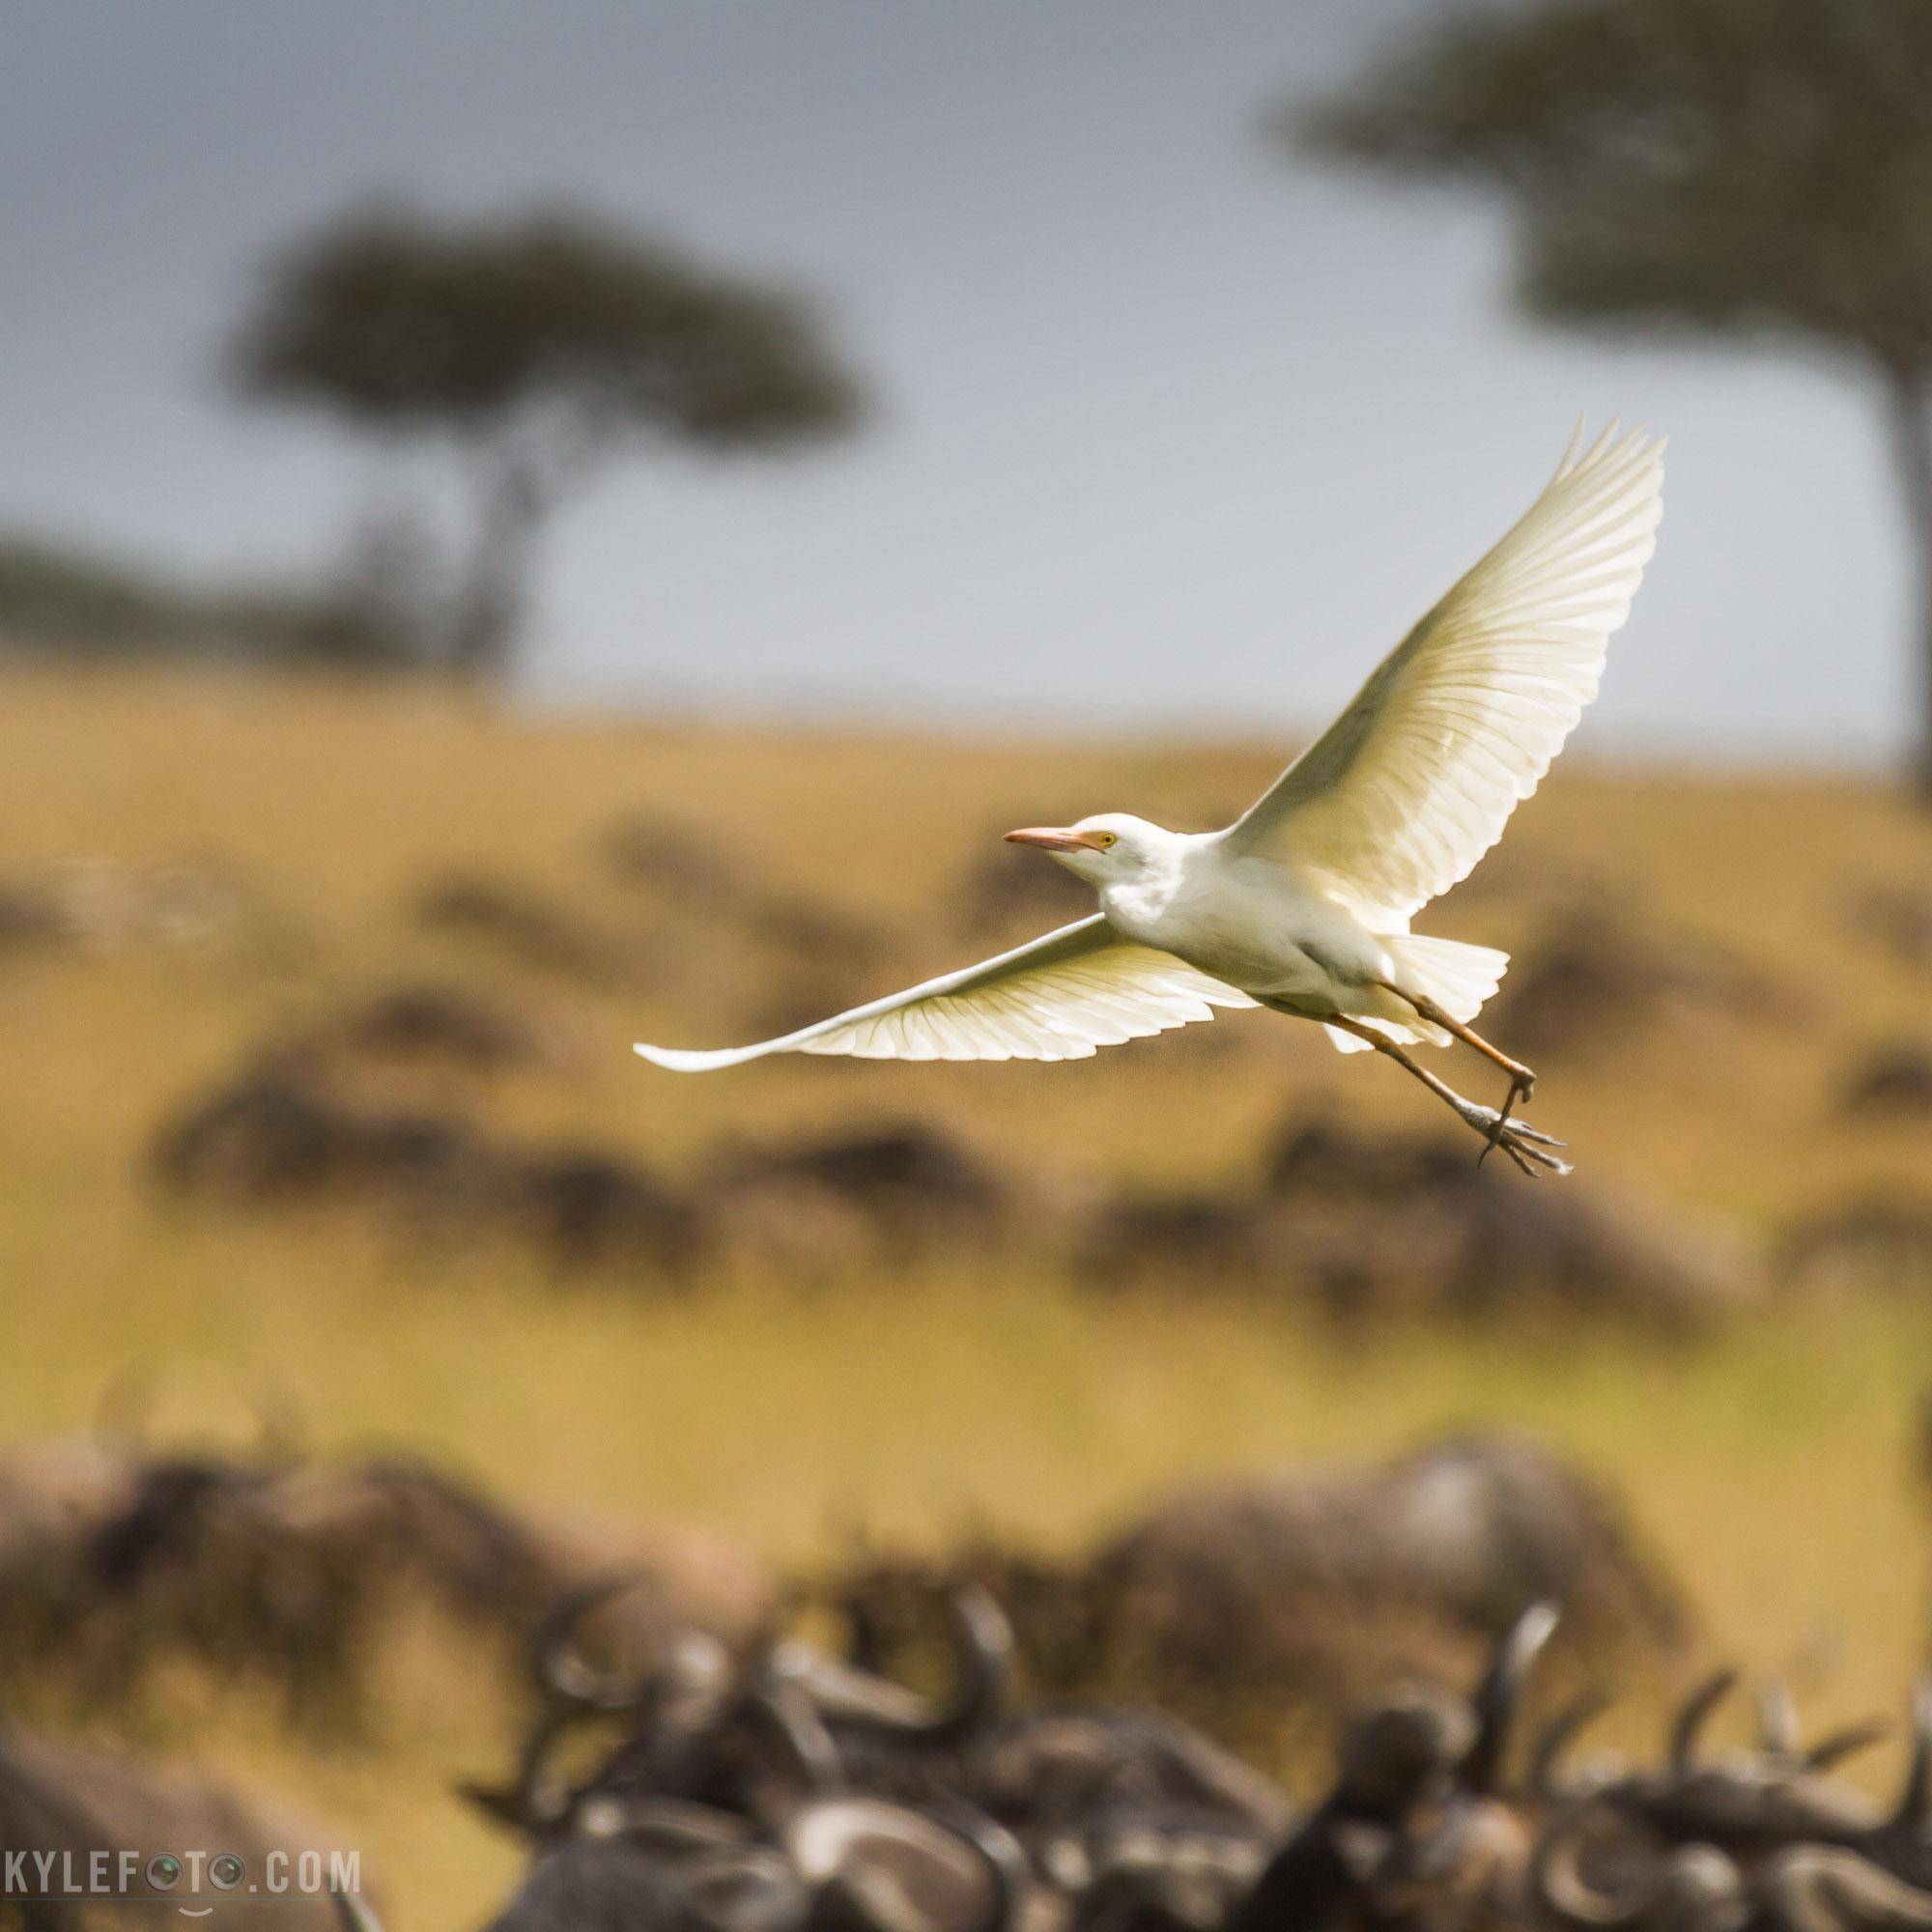 egret-on-the-wing-12.jpg